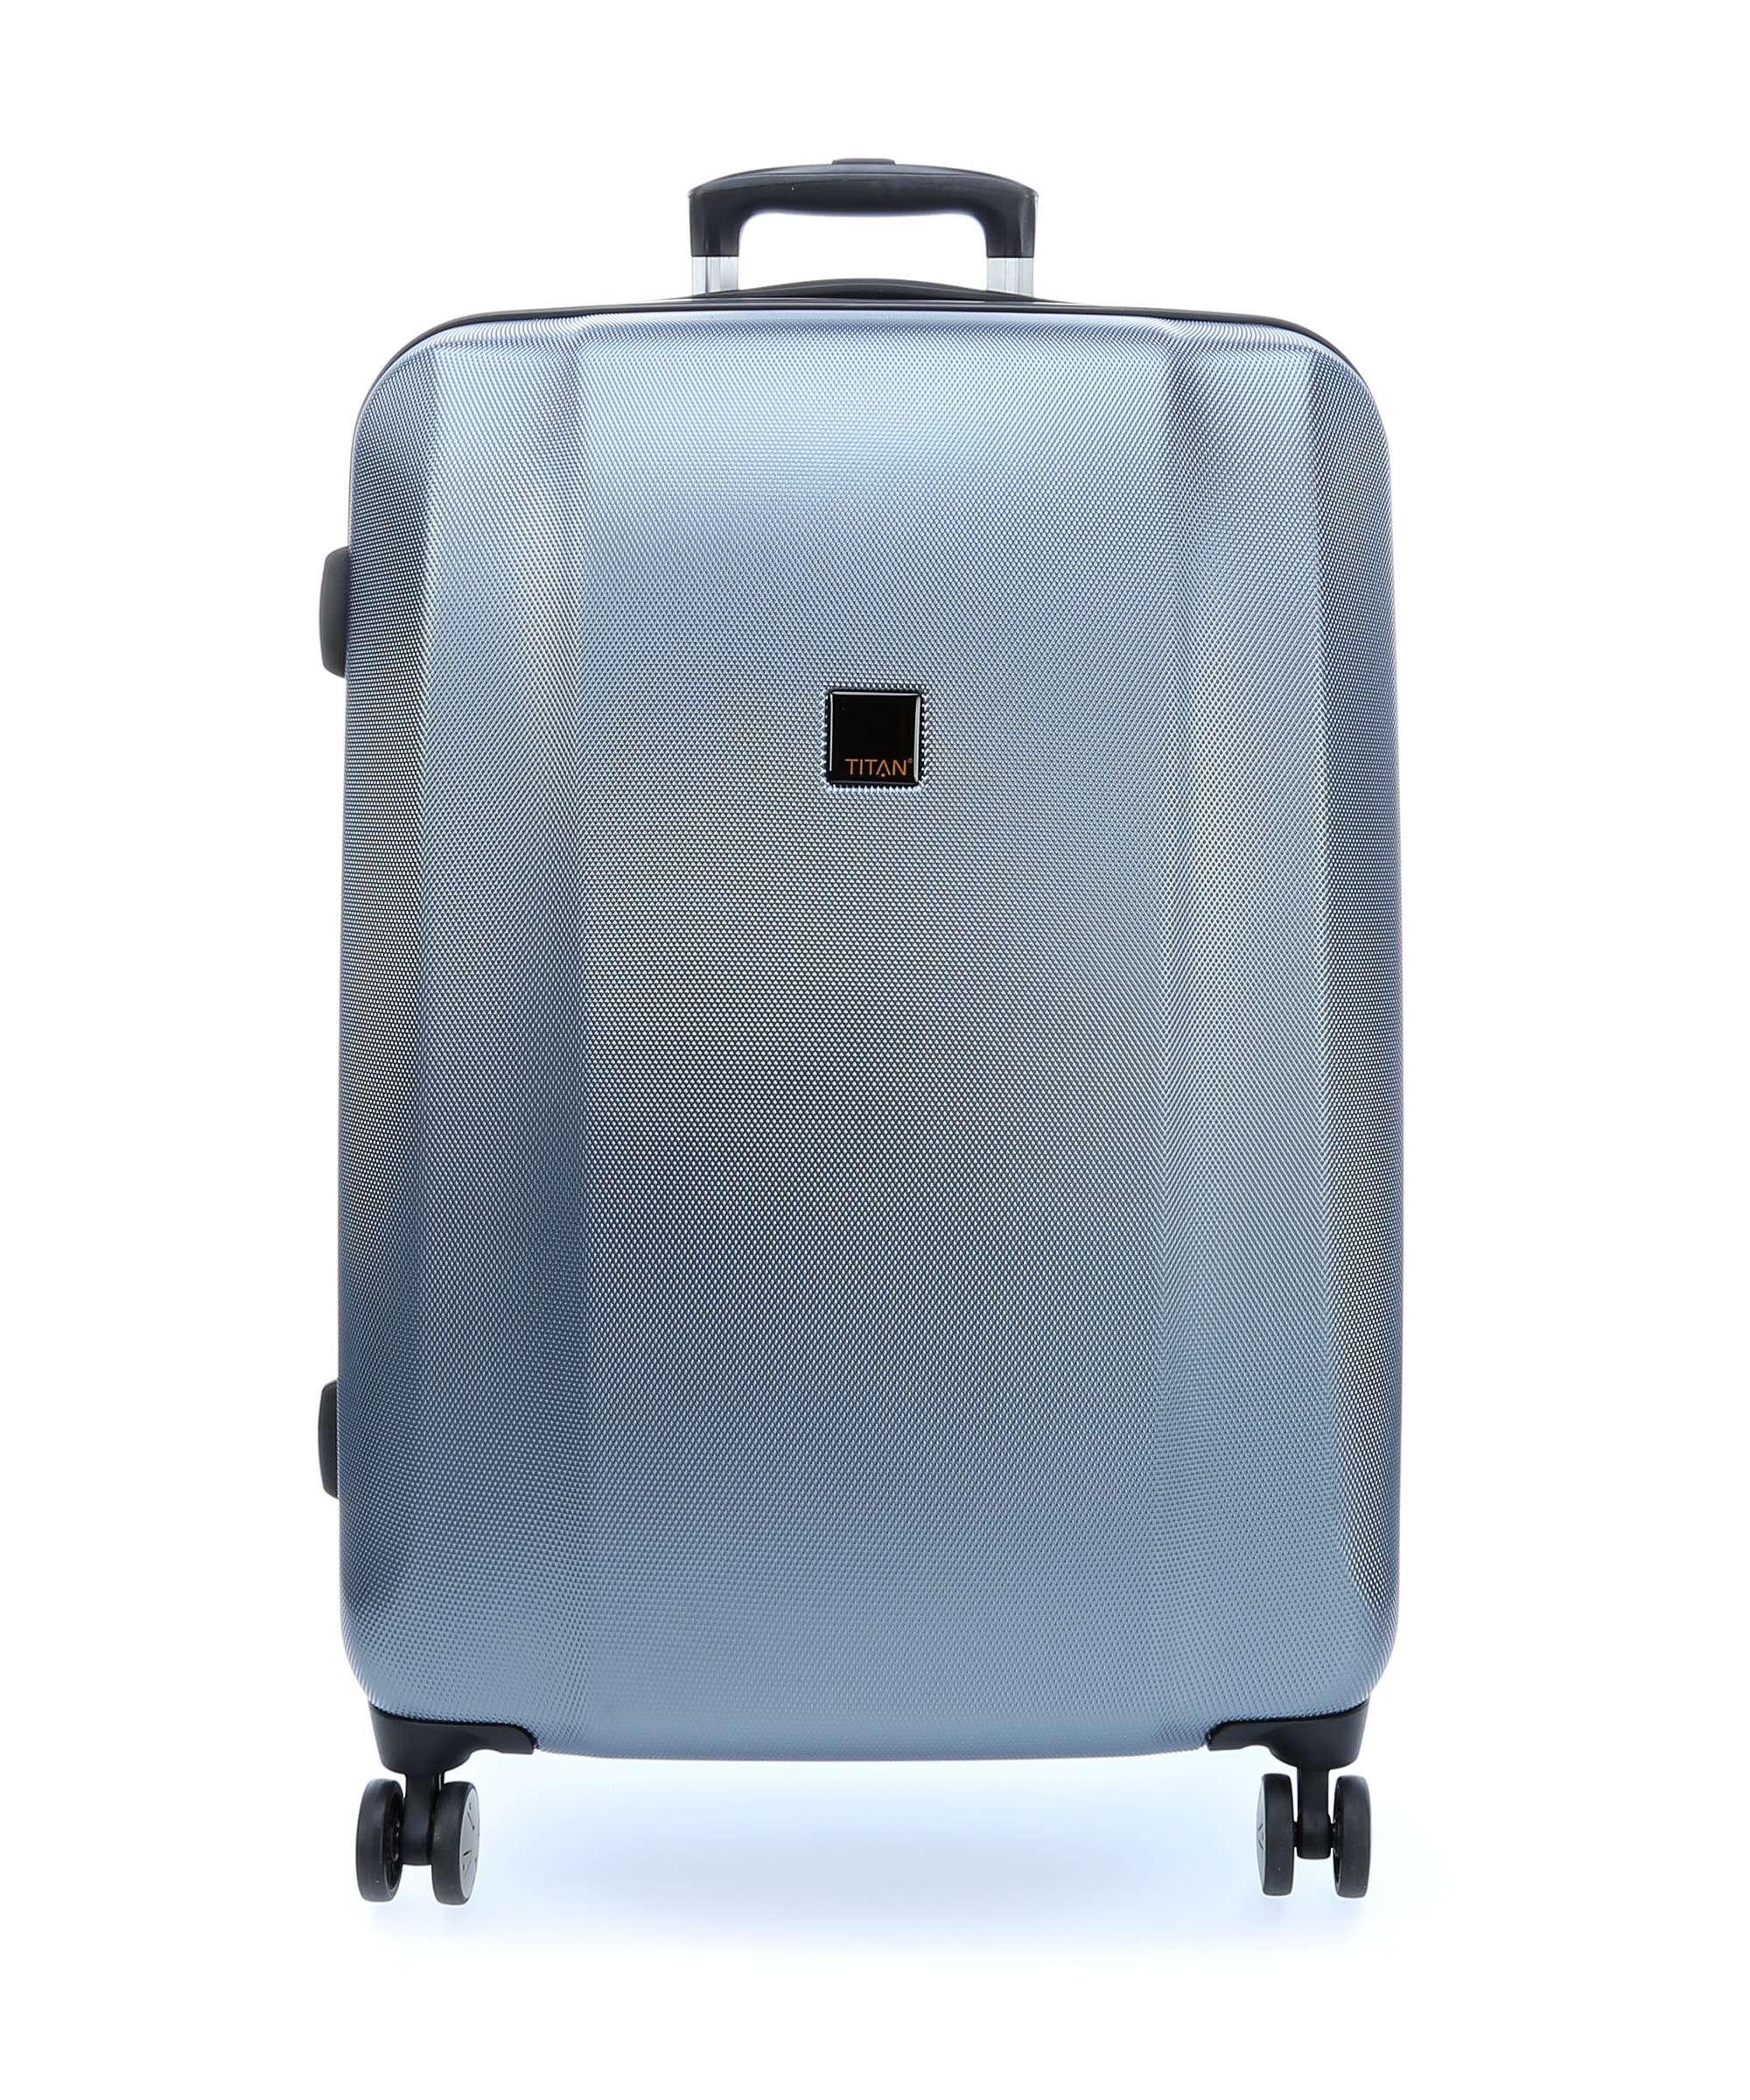 Troler de cabina cu USB - TITAN XENON 4 roti 55 cm (S) - Albastru